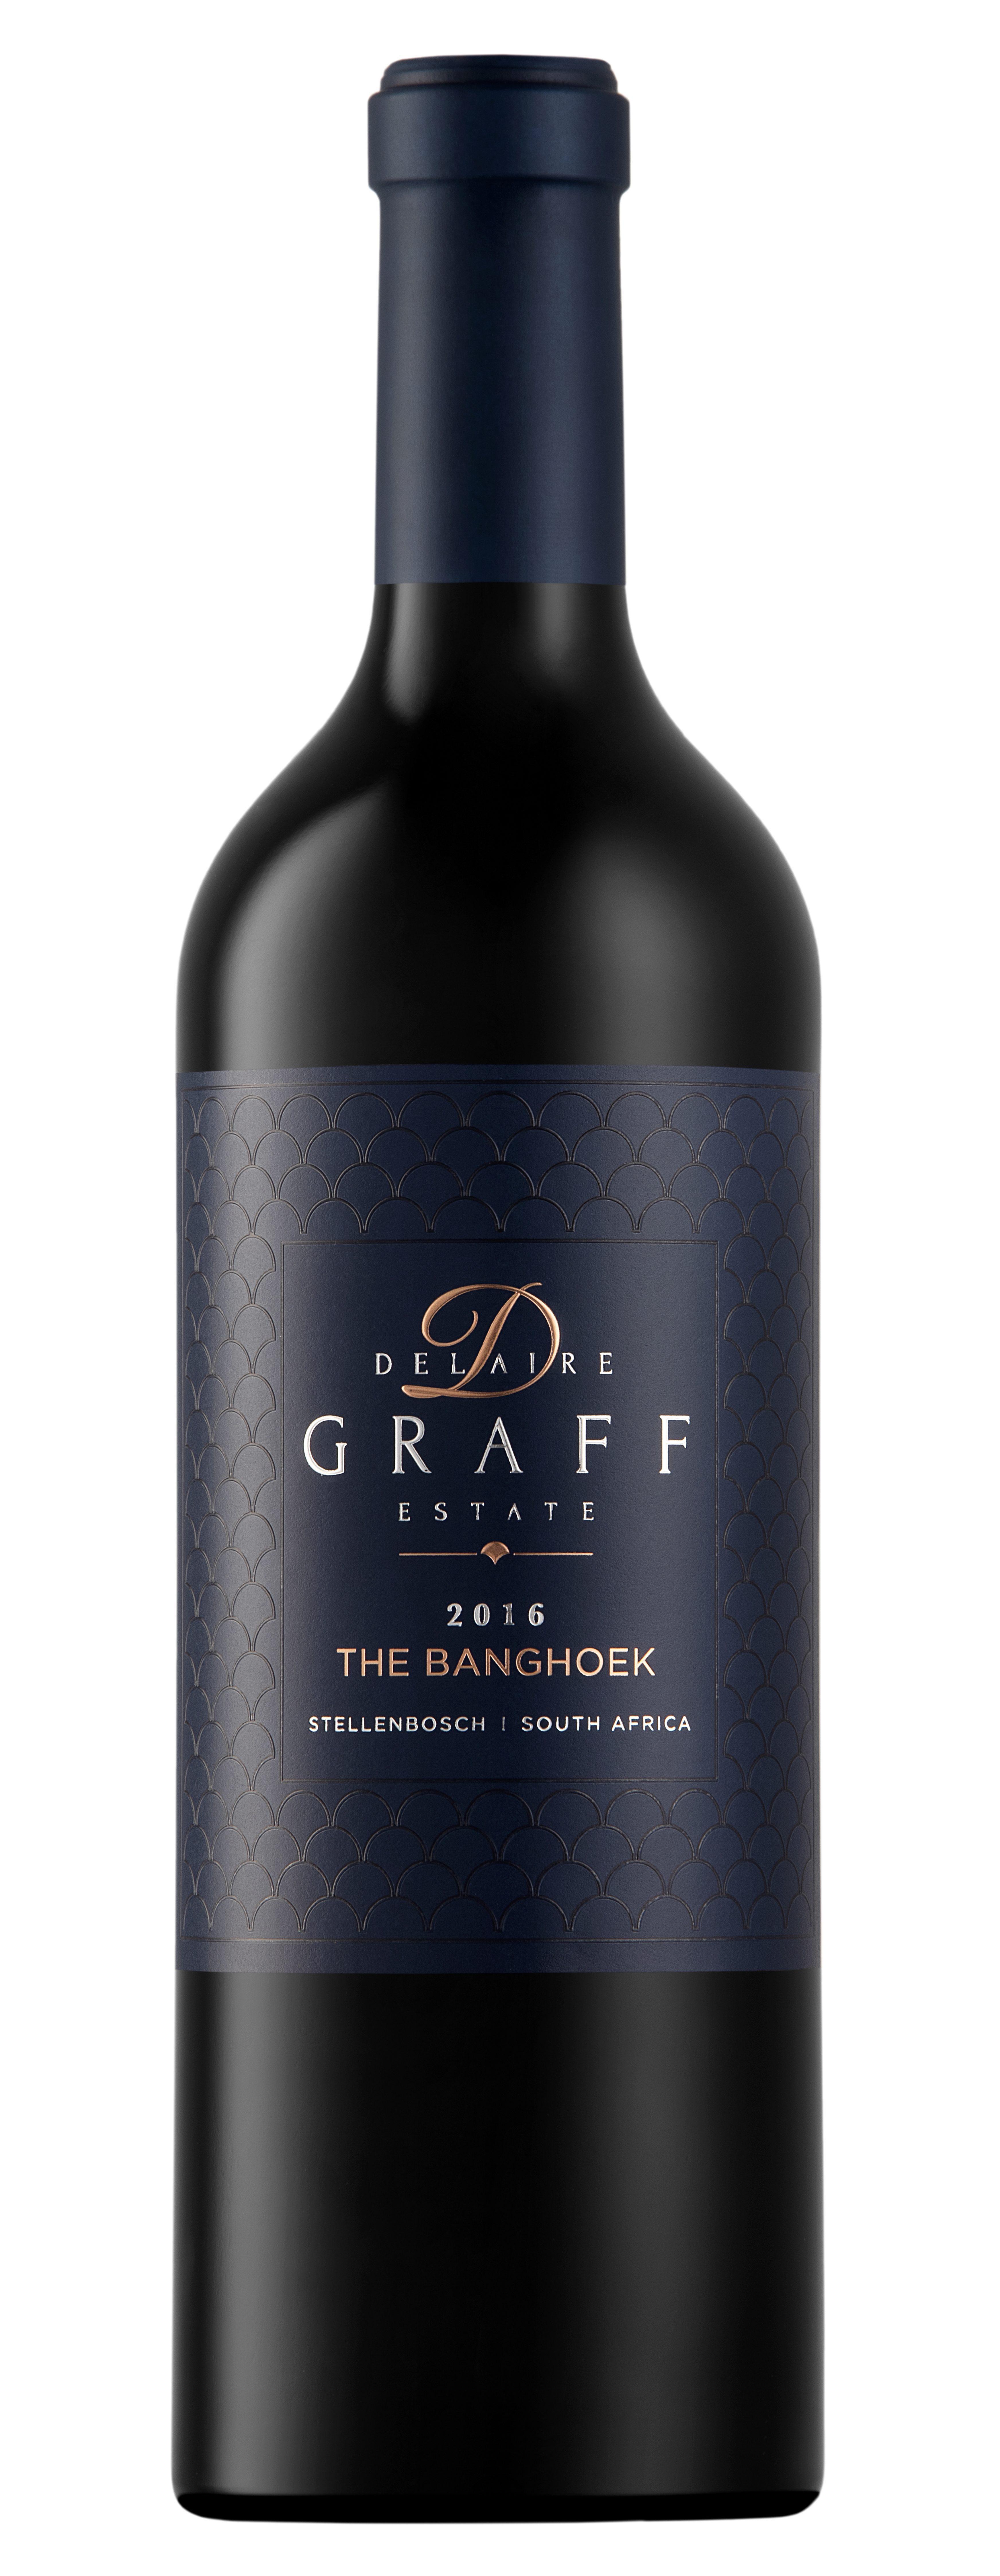 A bottle of Delaire Graff Estate The Banghoek 2016 wine